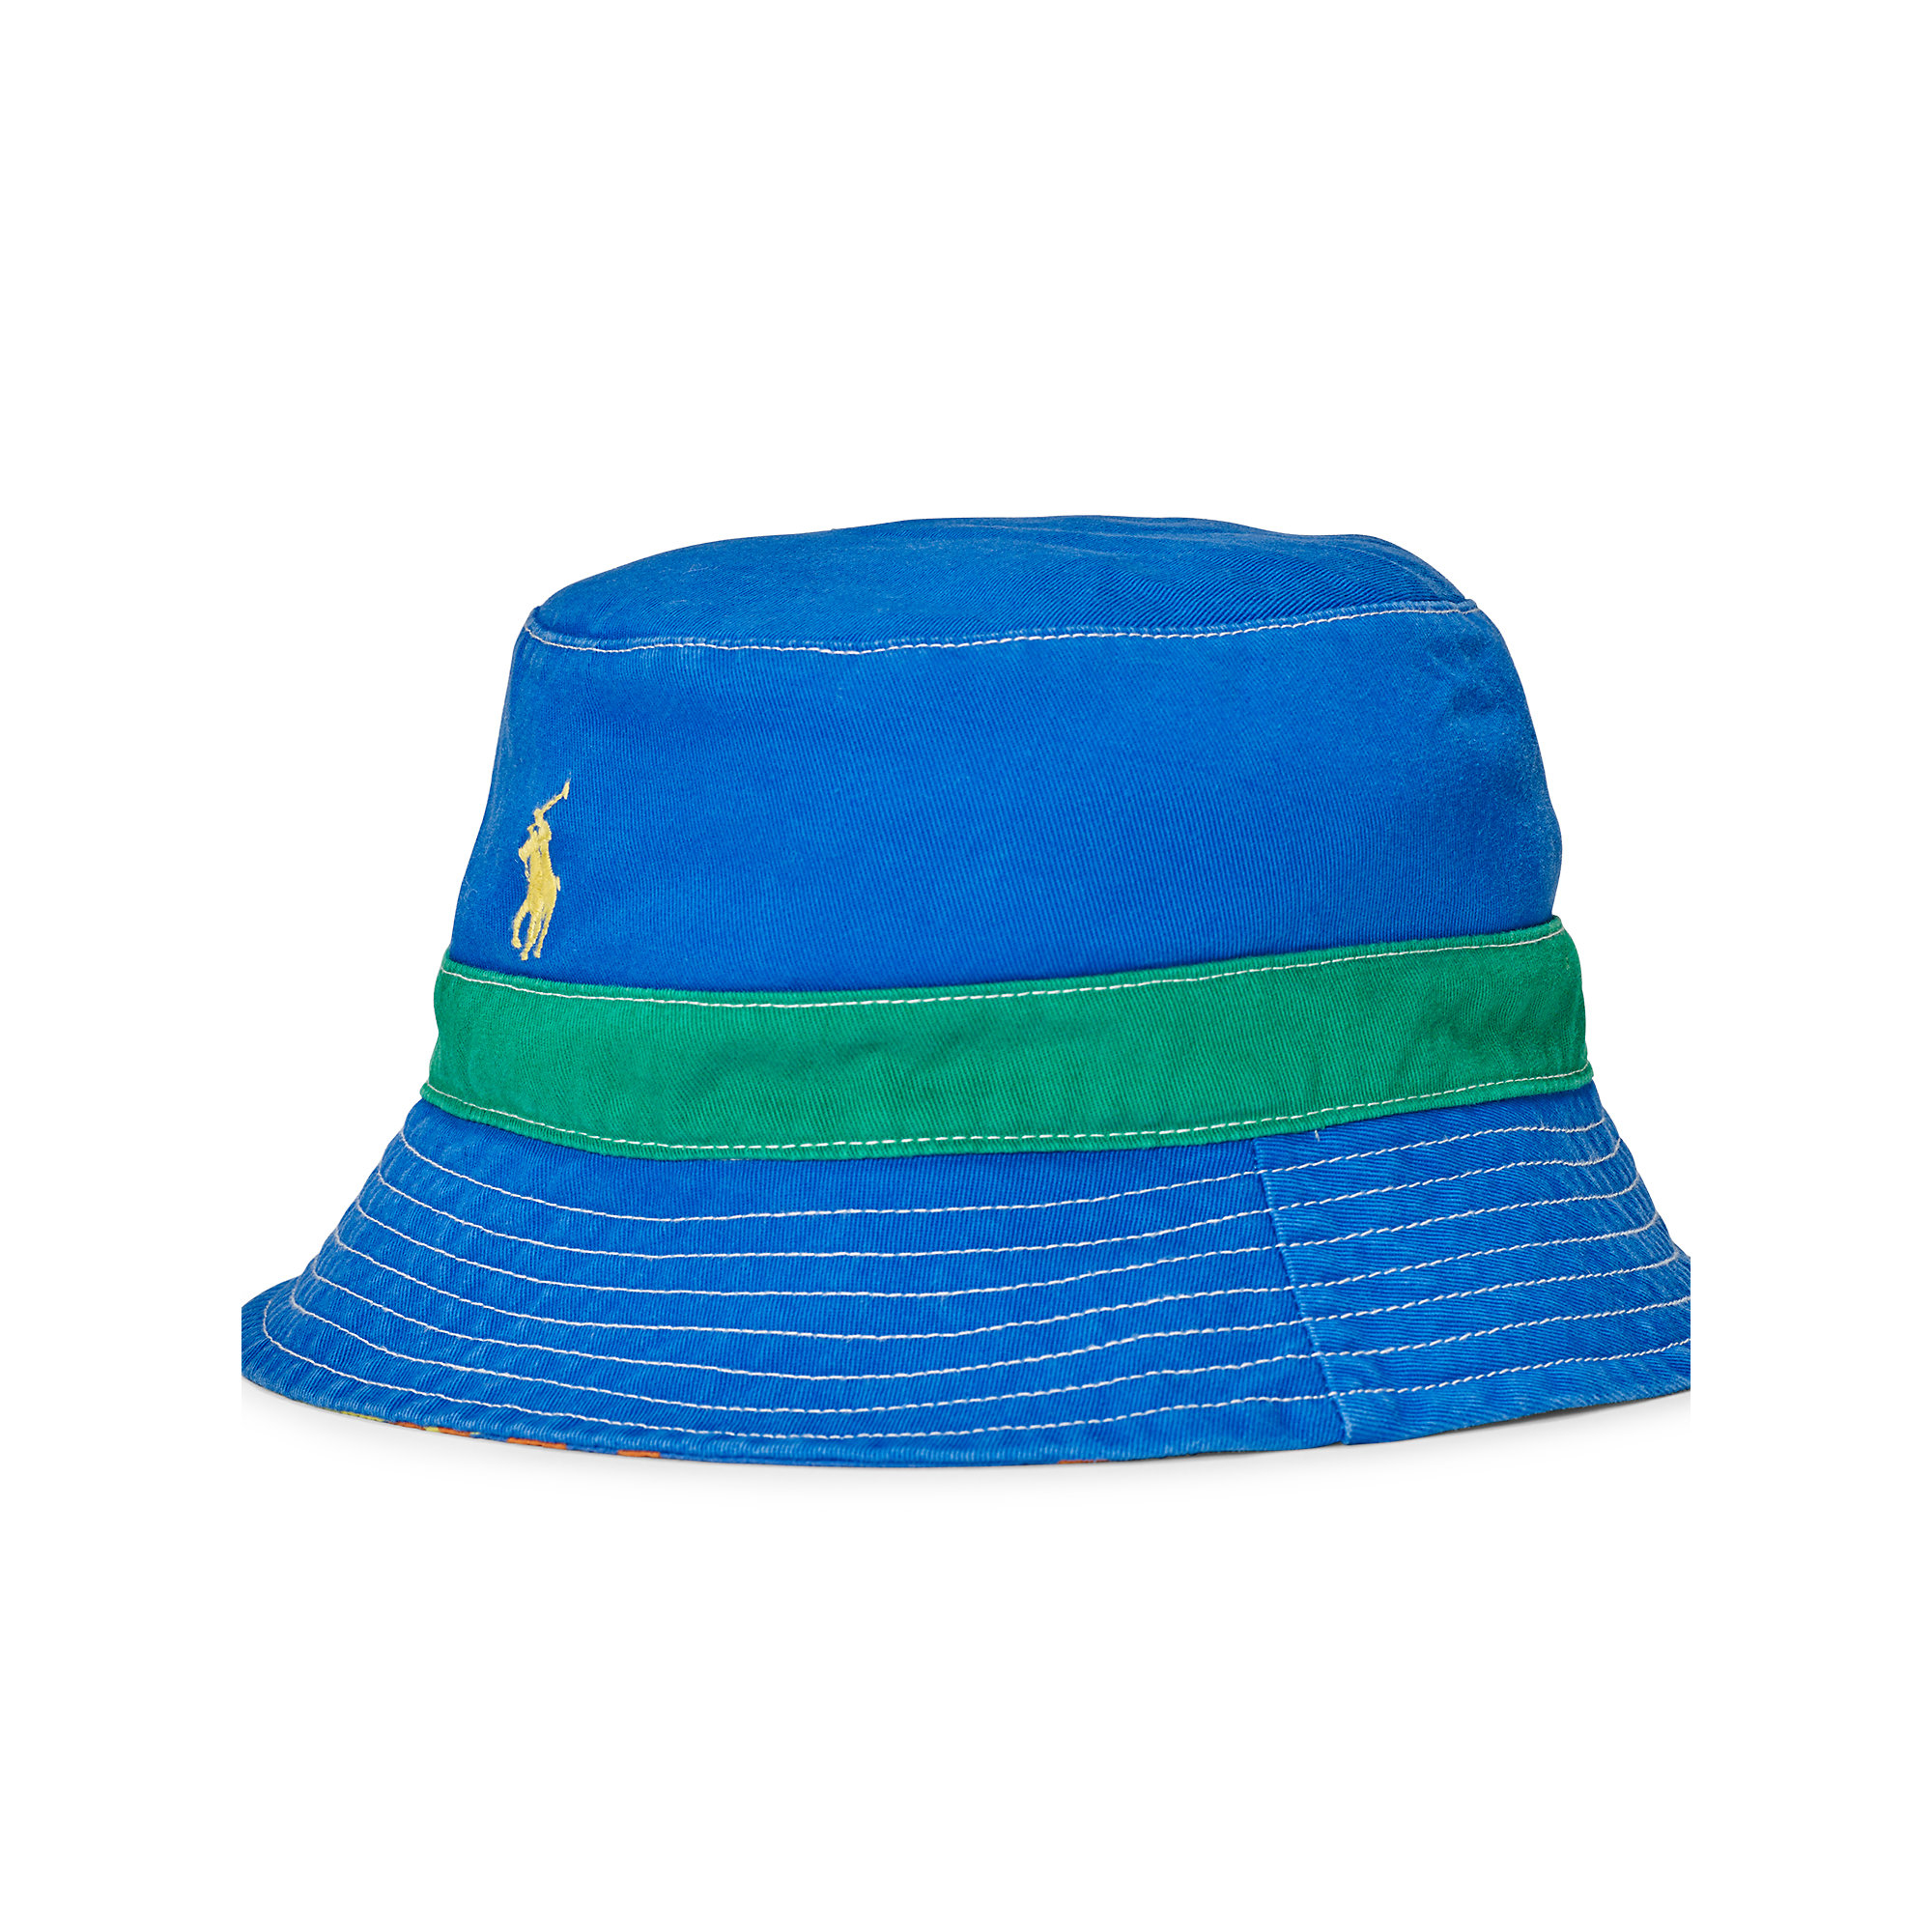 ce0c87f7dfaeb Polo Ralph Lauren Reversible Twill Bucket Hat for Men - Lyst